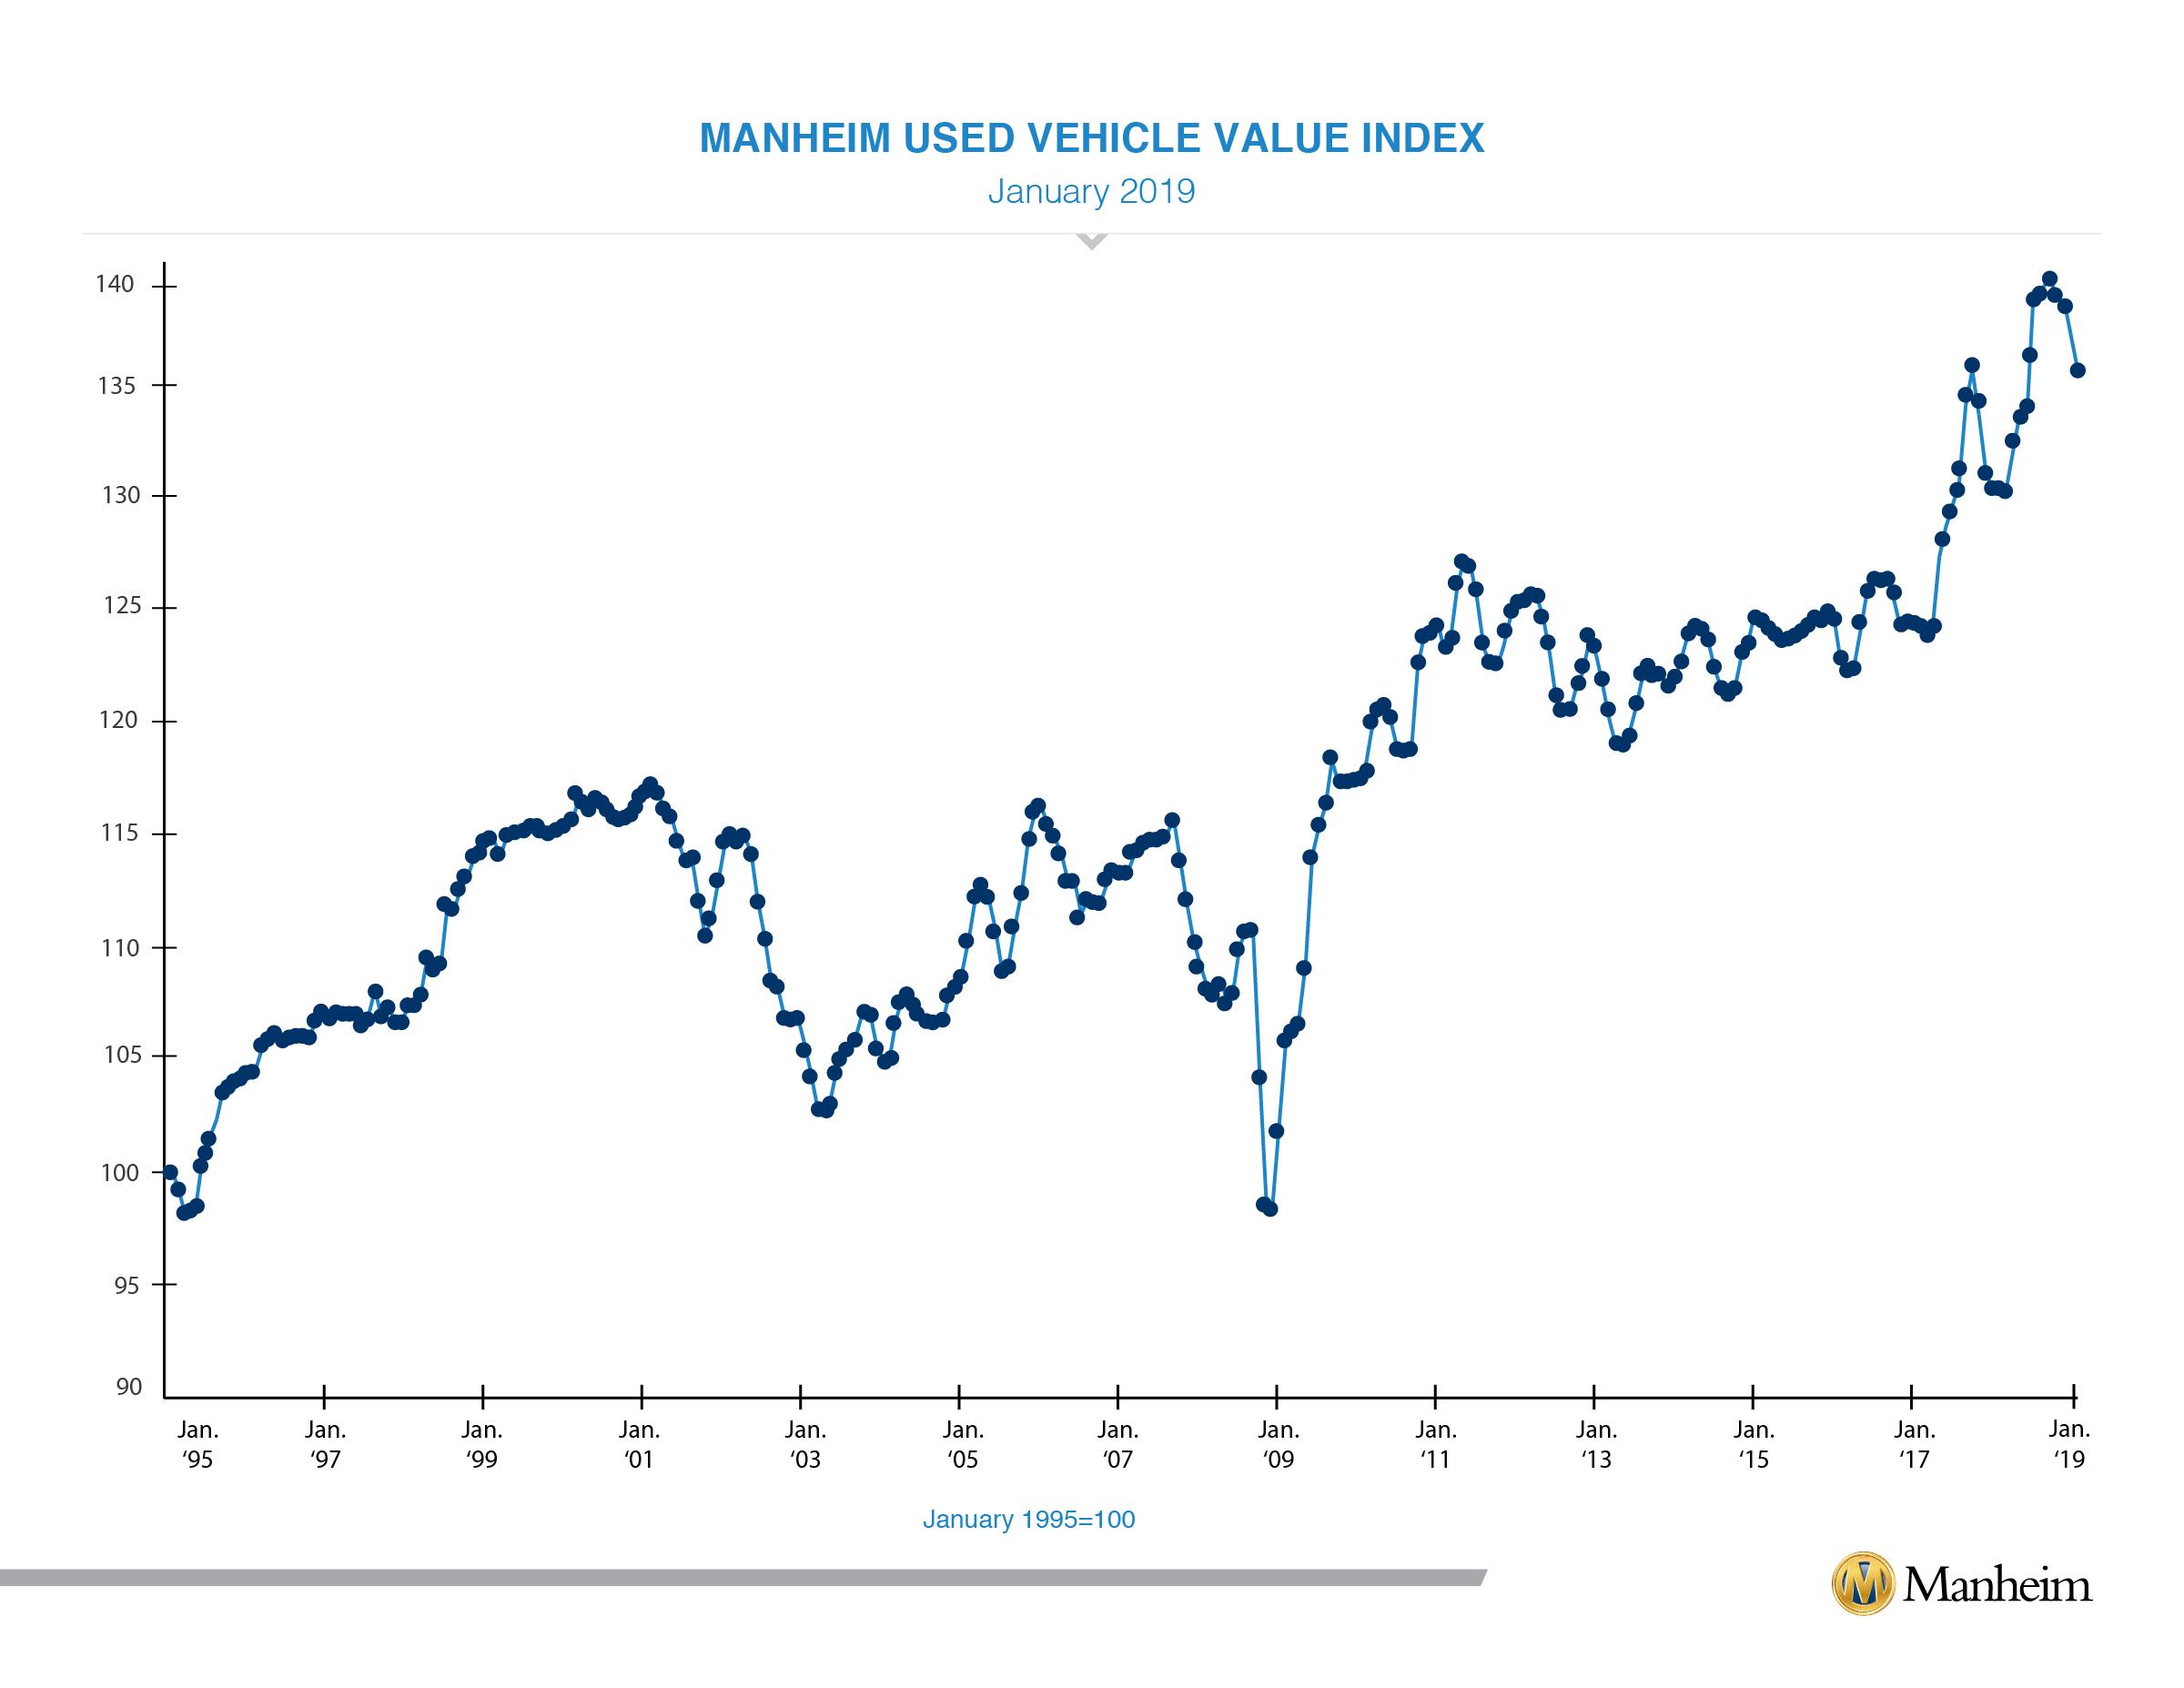 January 2019 muvvi index graph